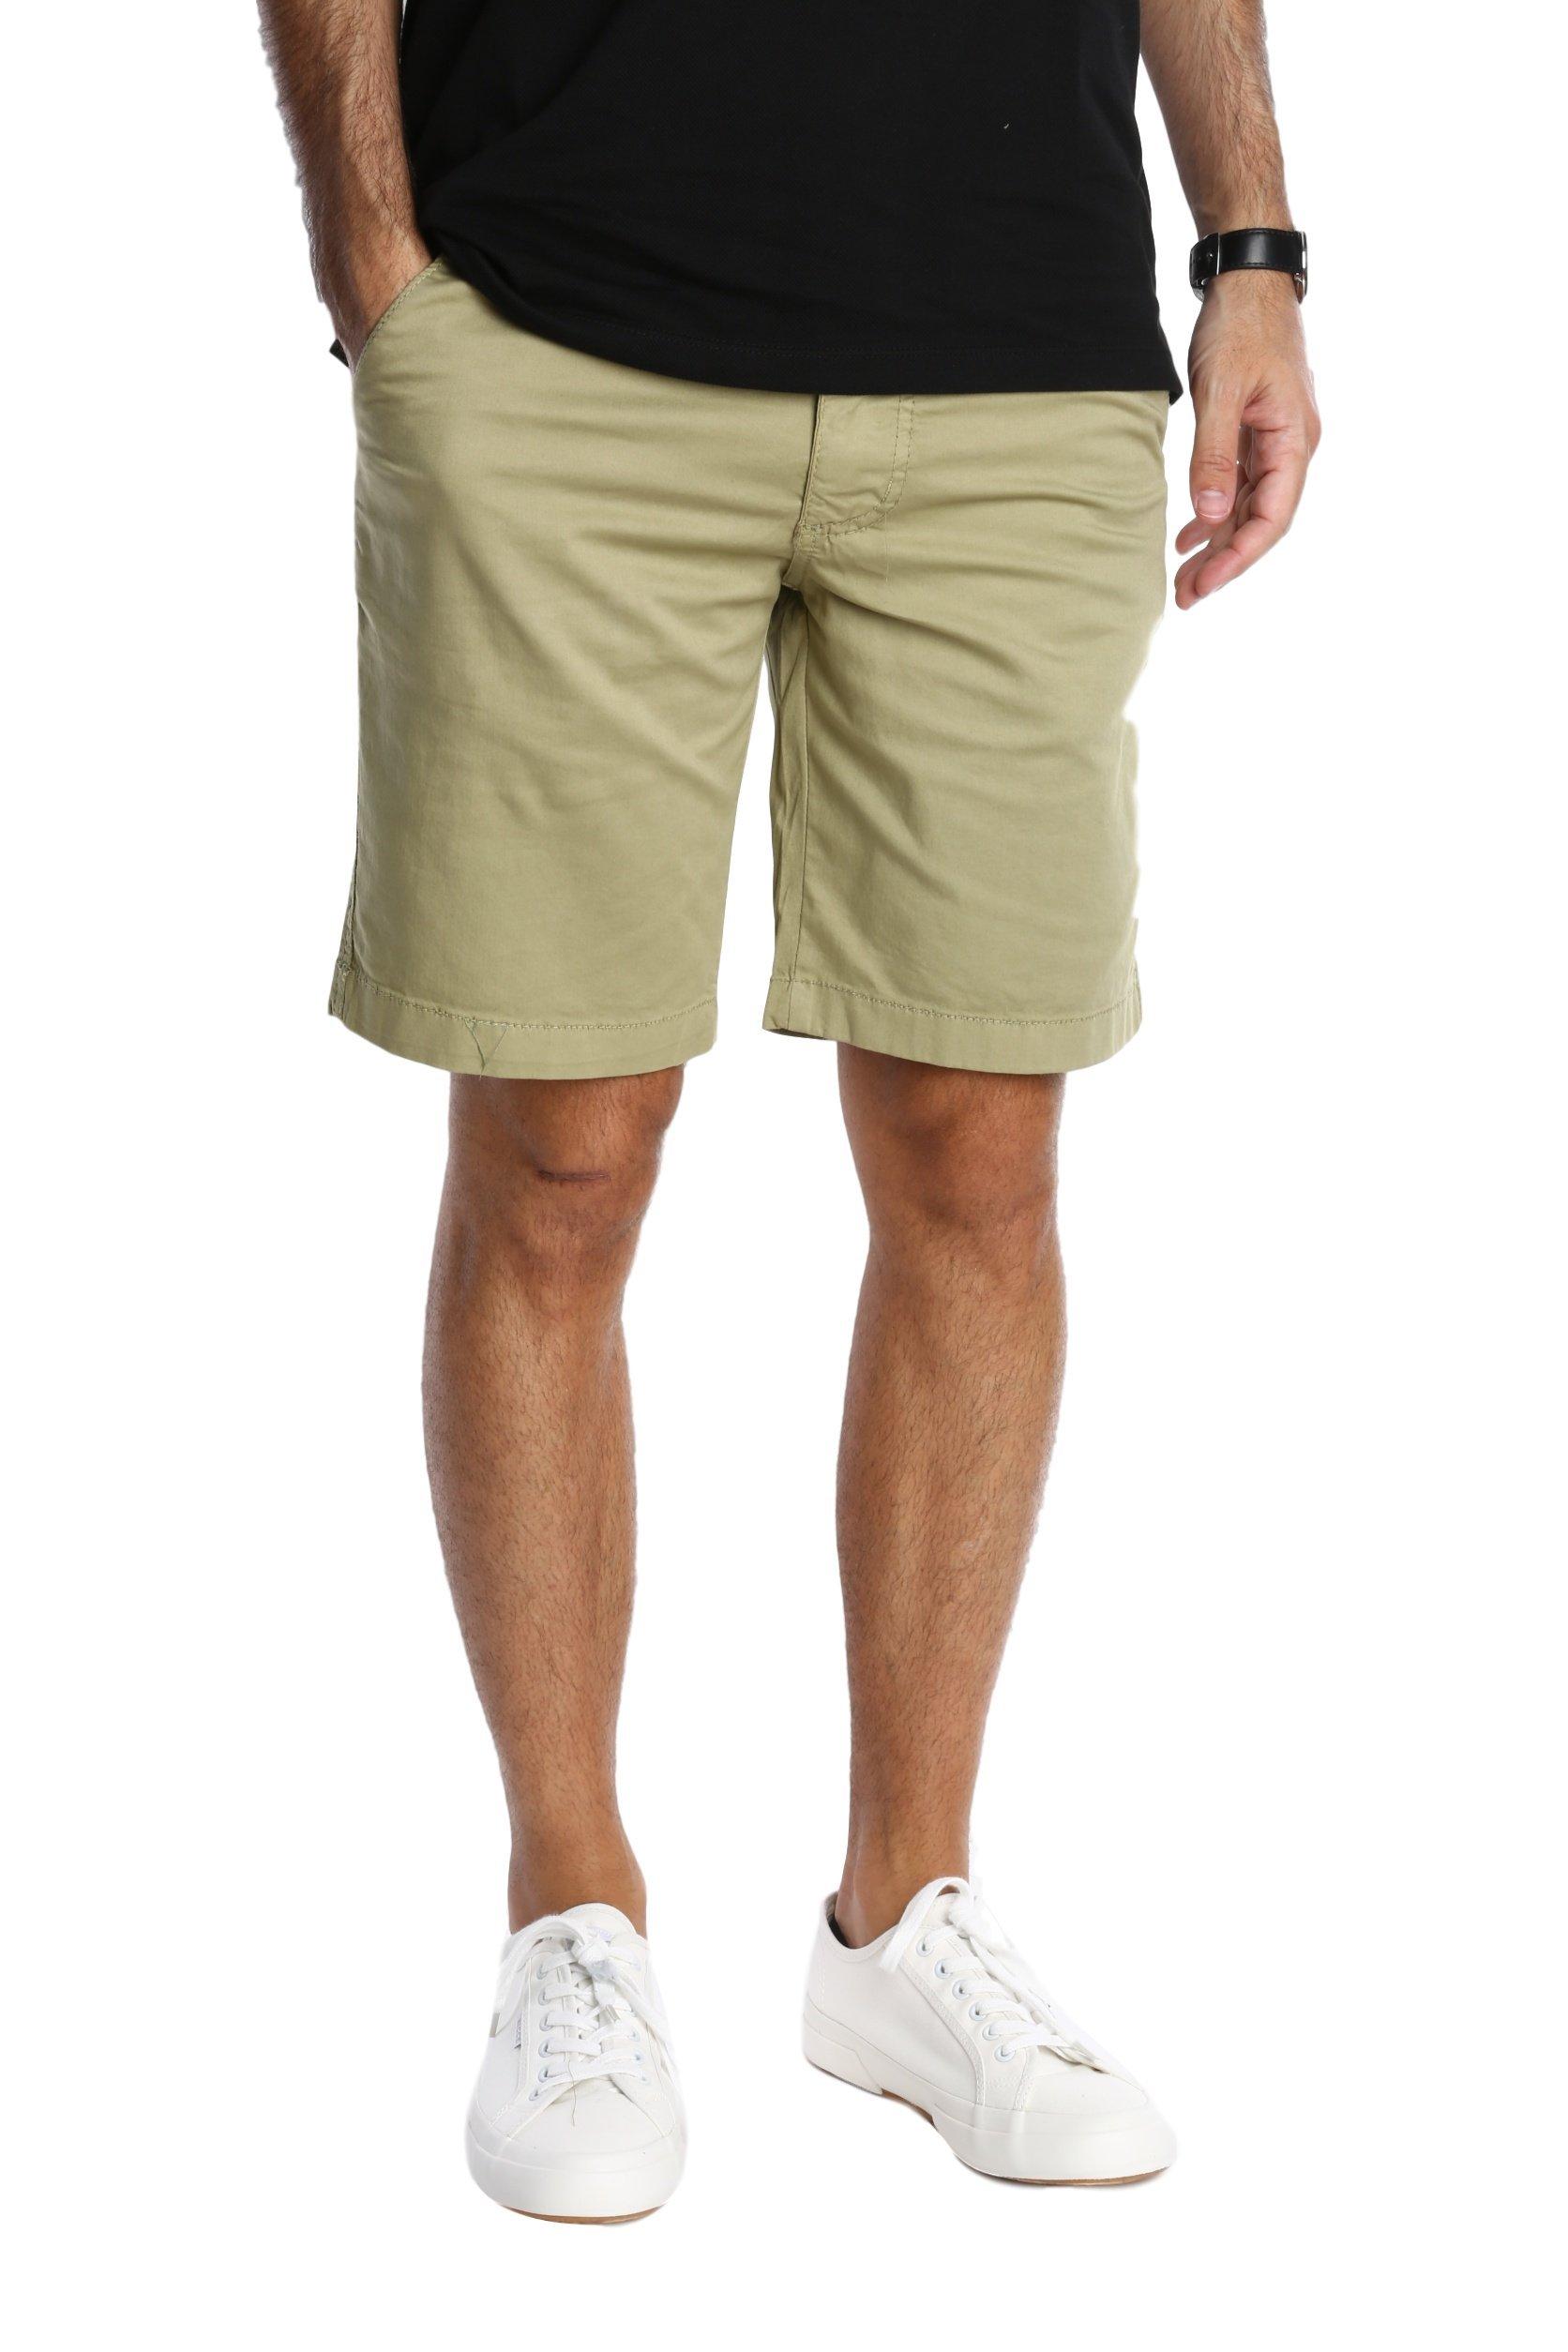 Pembrook Men's Casual Shorts n Shorts - 34 Khaki - Flat Front Classic Fit